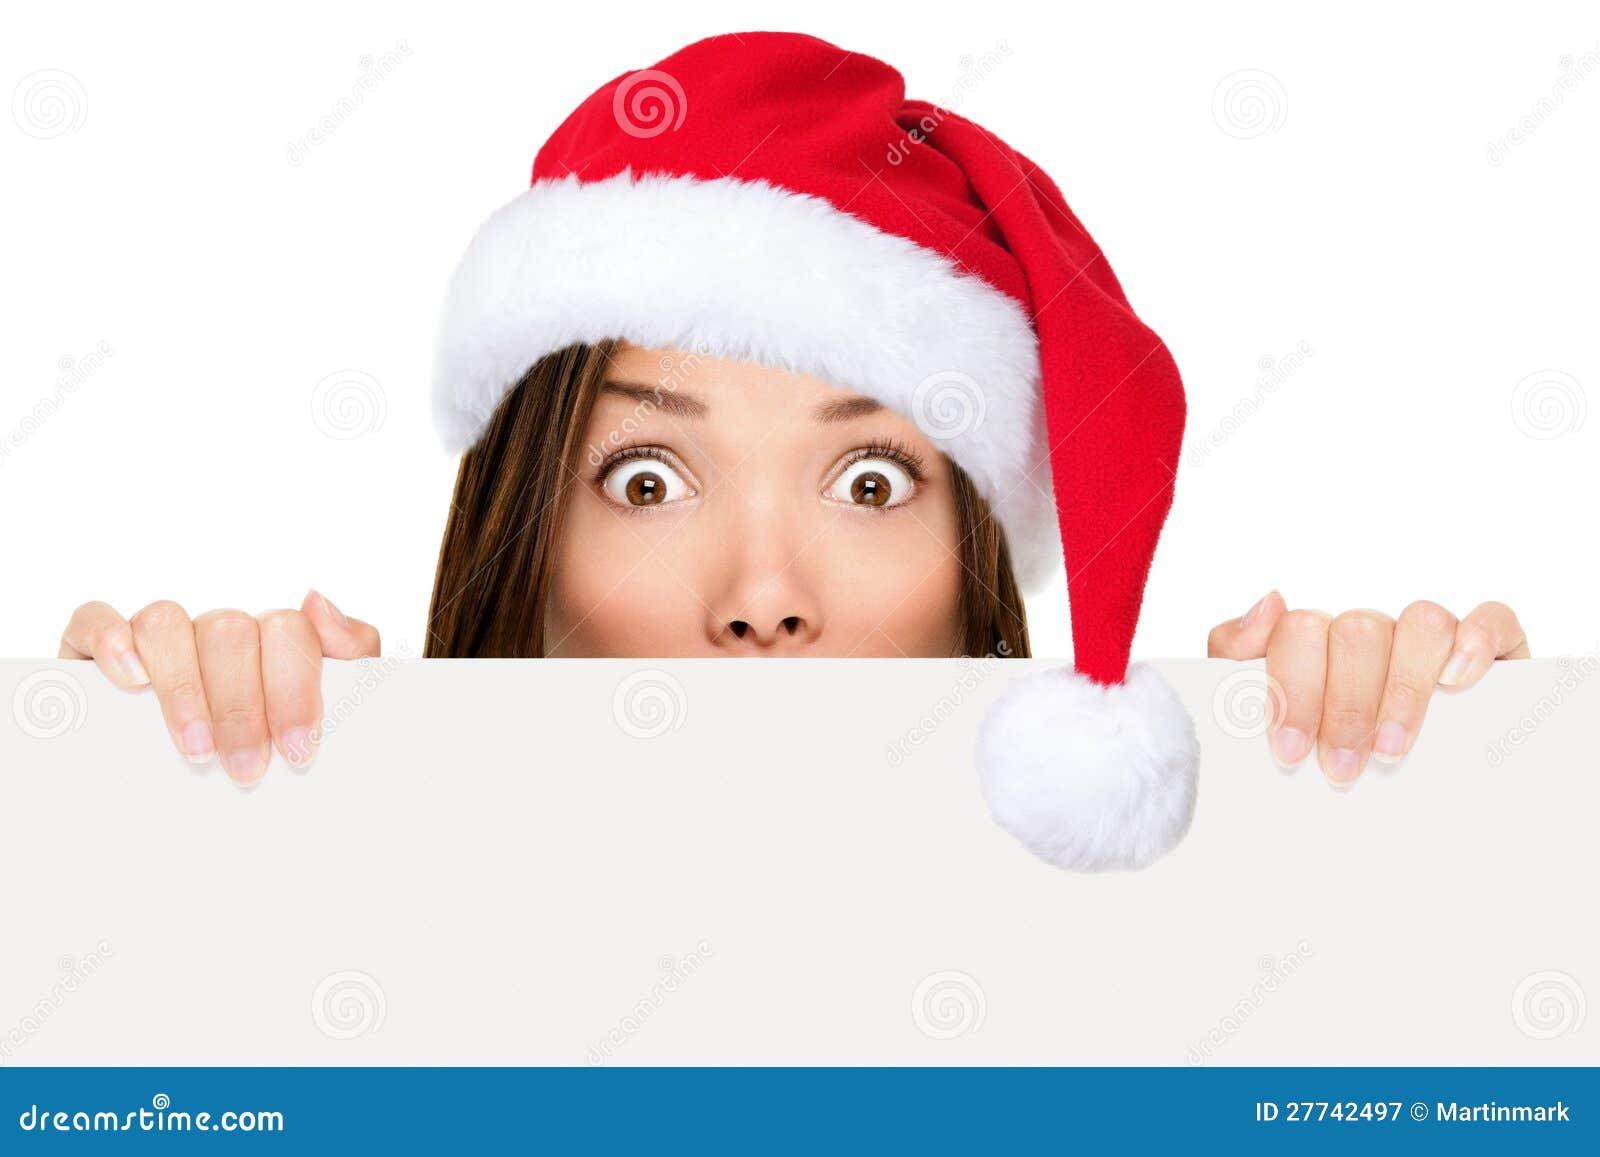 Santa hat woman showing christmas sign